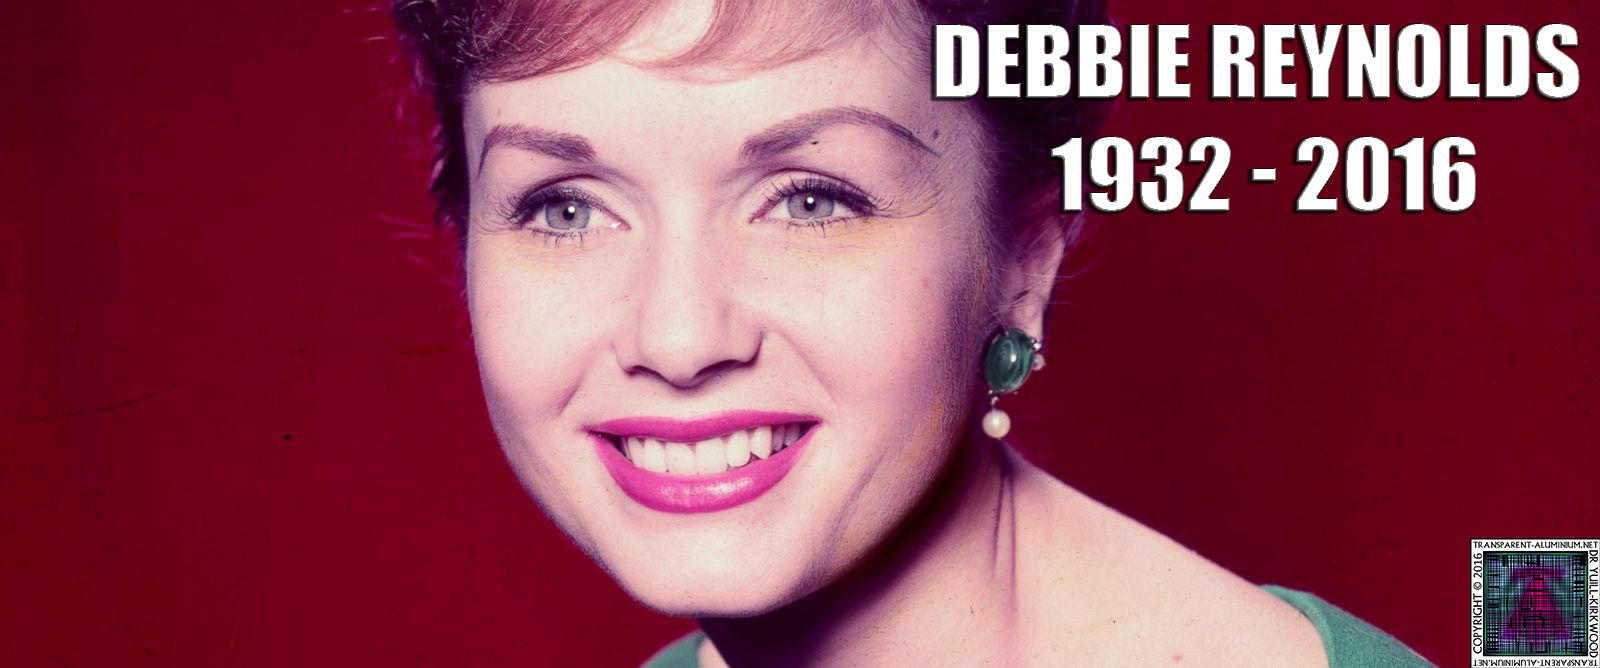 debbie-reynolds-1932-2016-1